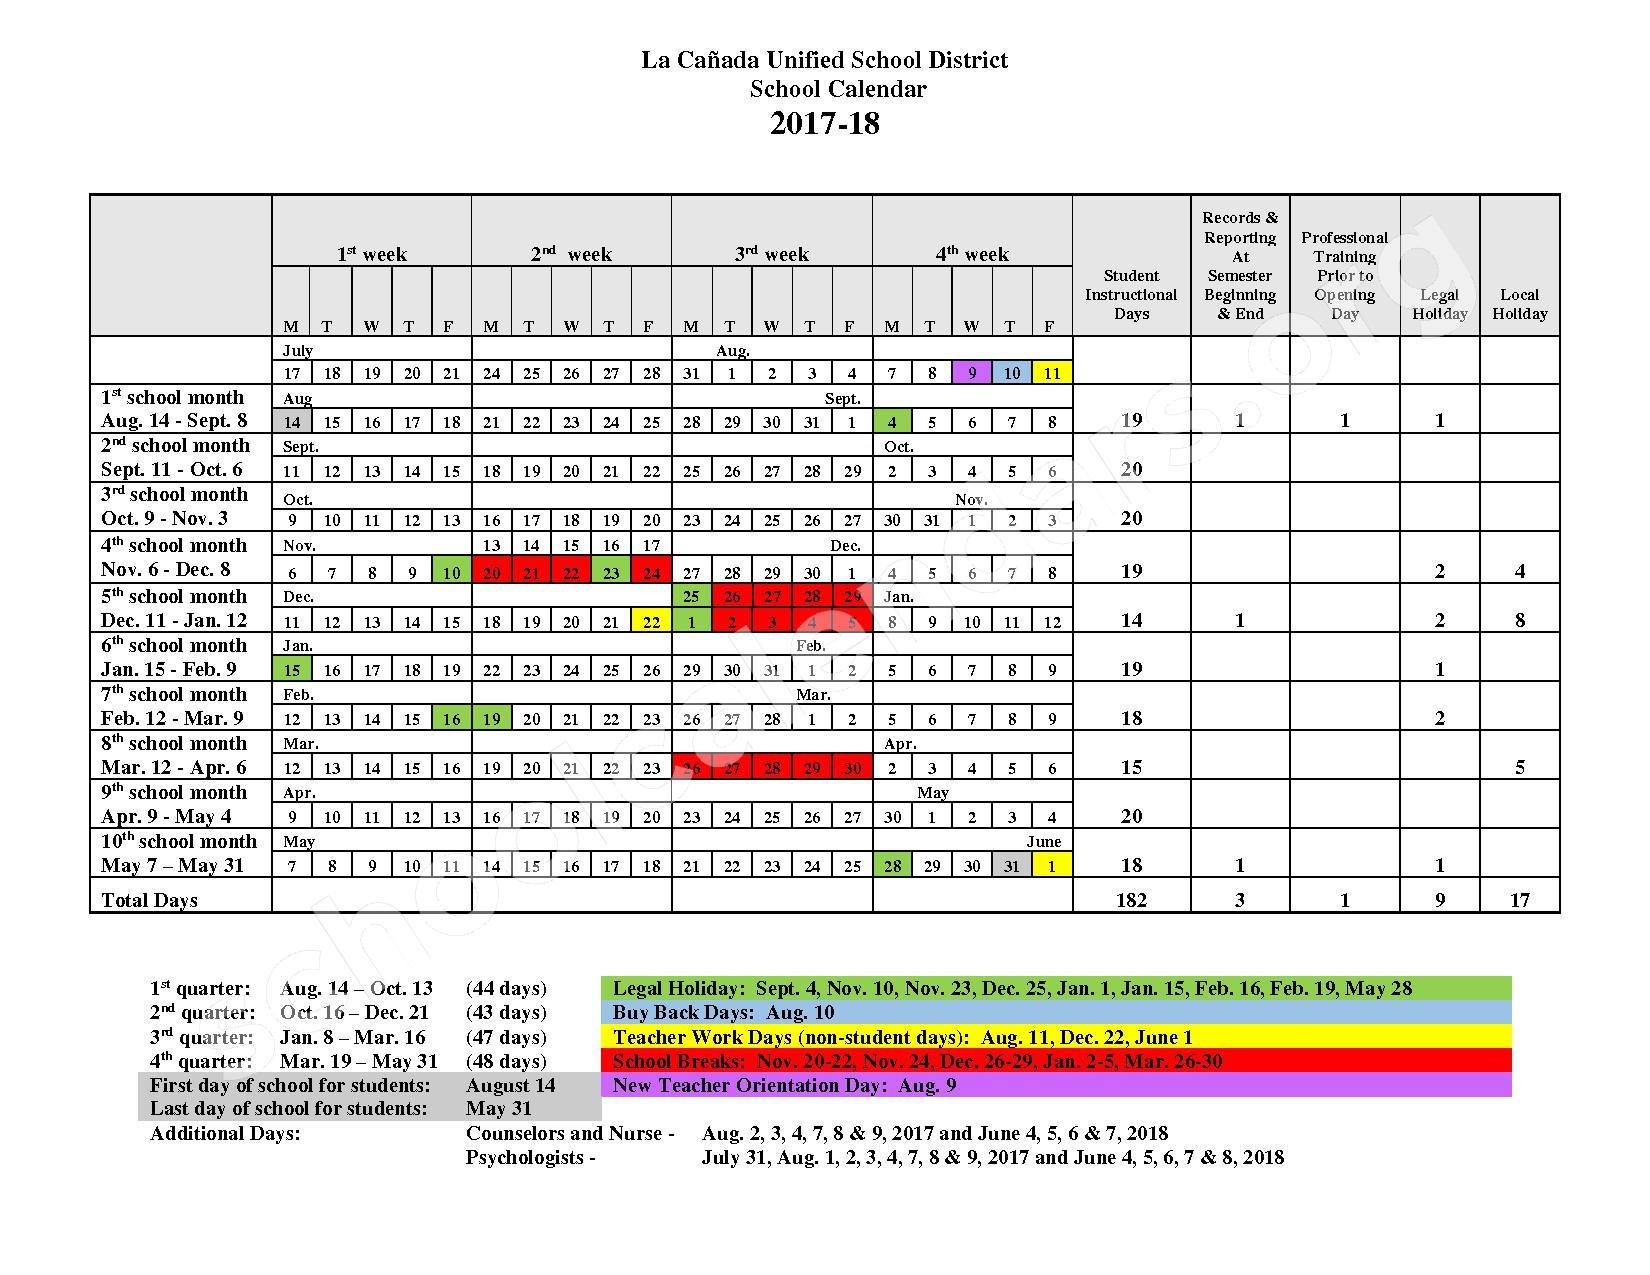 2017 - 2018 District Calendar – La Canada Unified School District – page 1